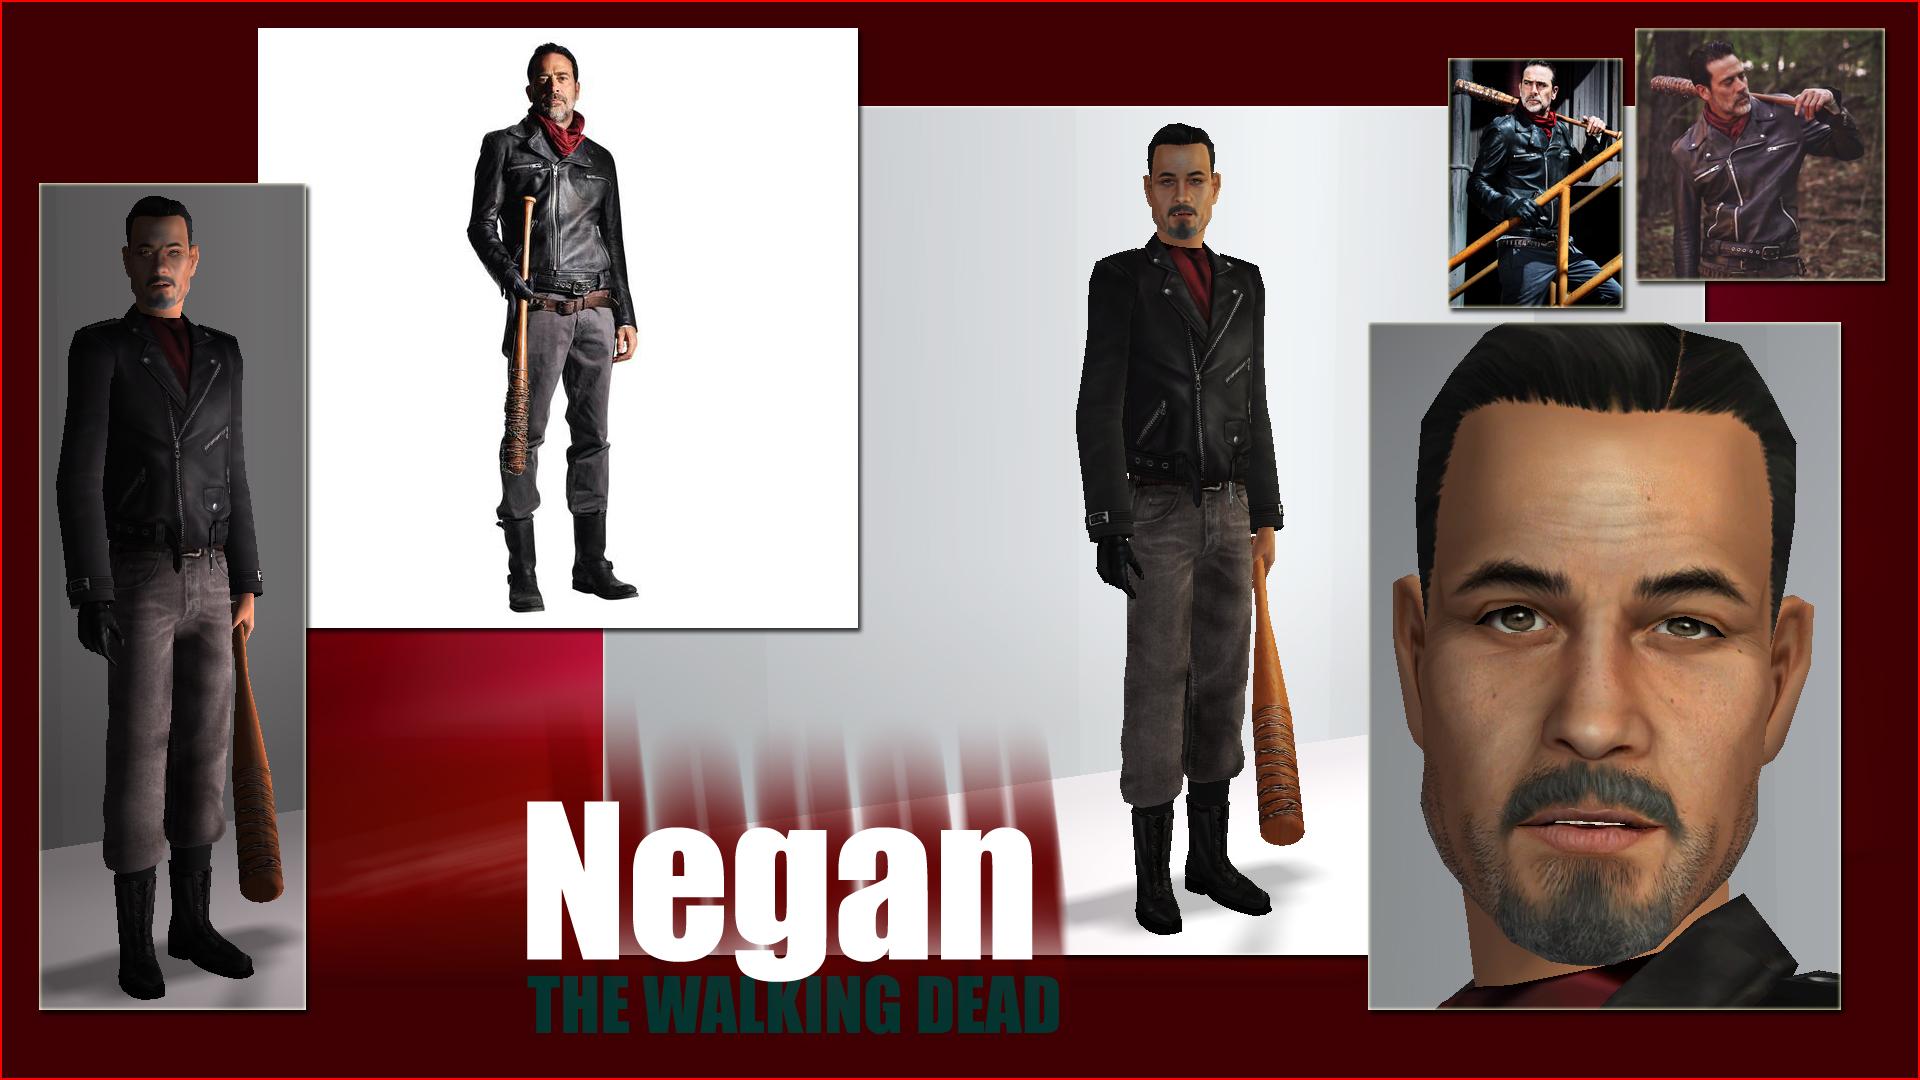 ModTheSims - The Walking Dead : NEGAN